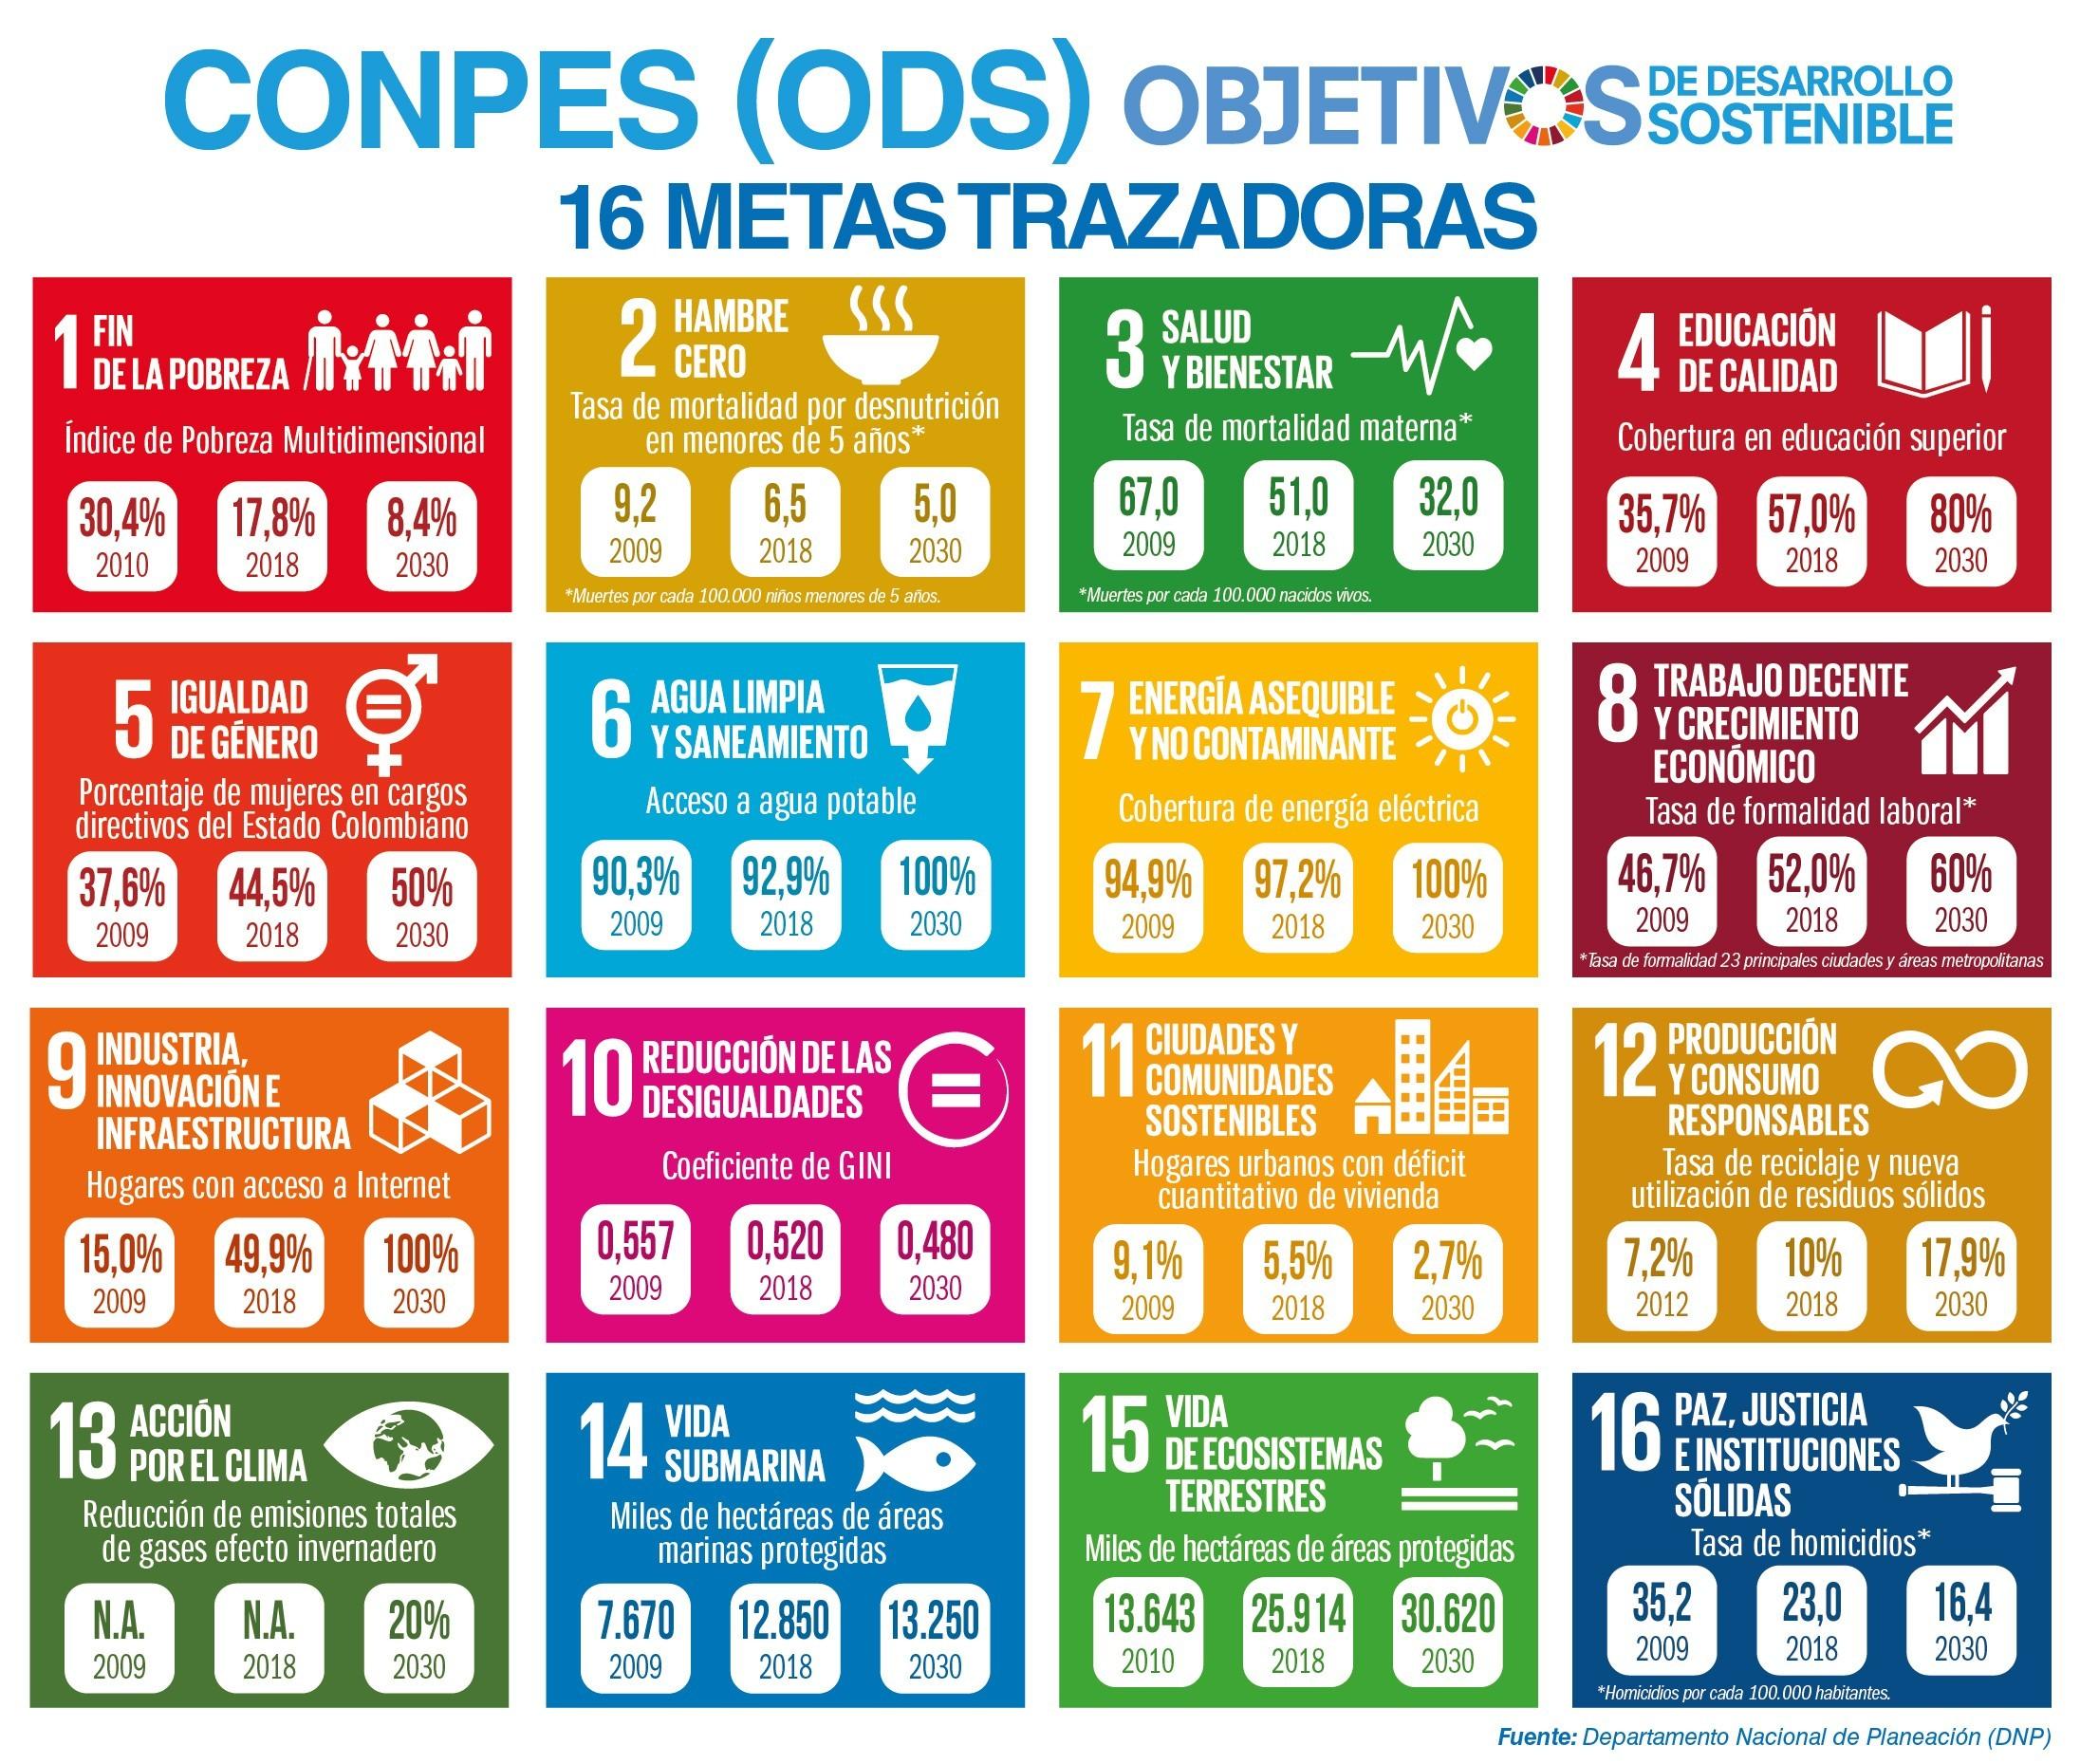 CONPES ODS FINAL